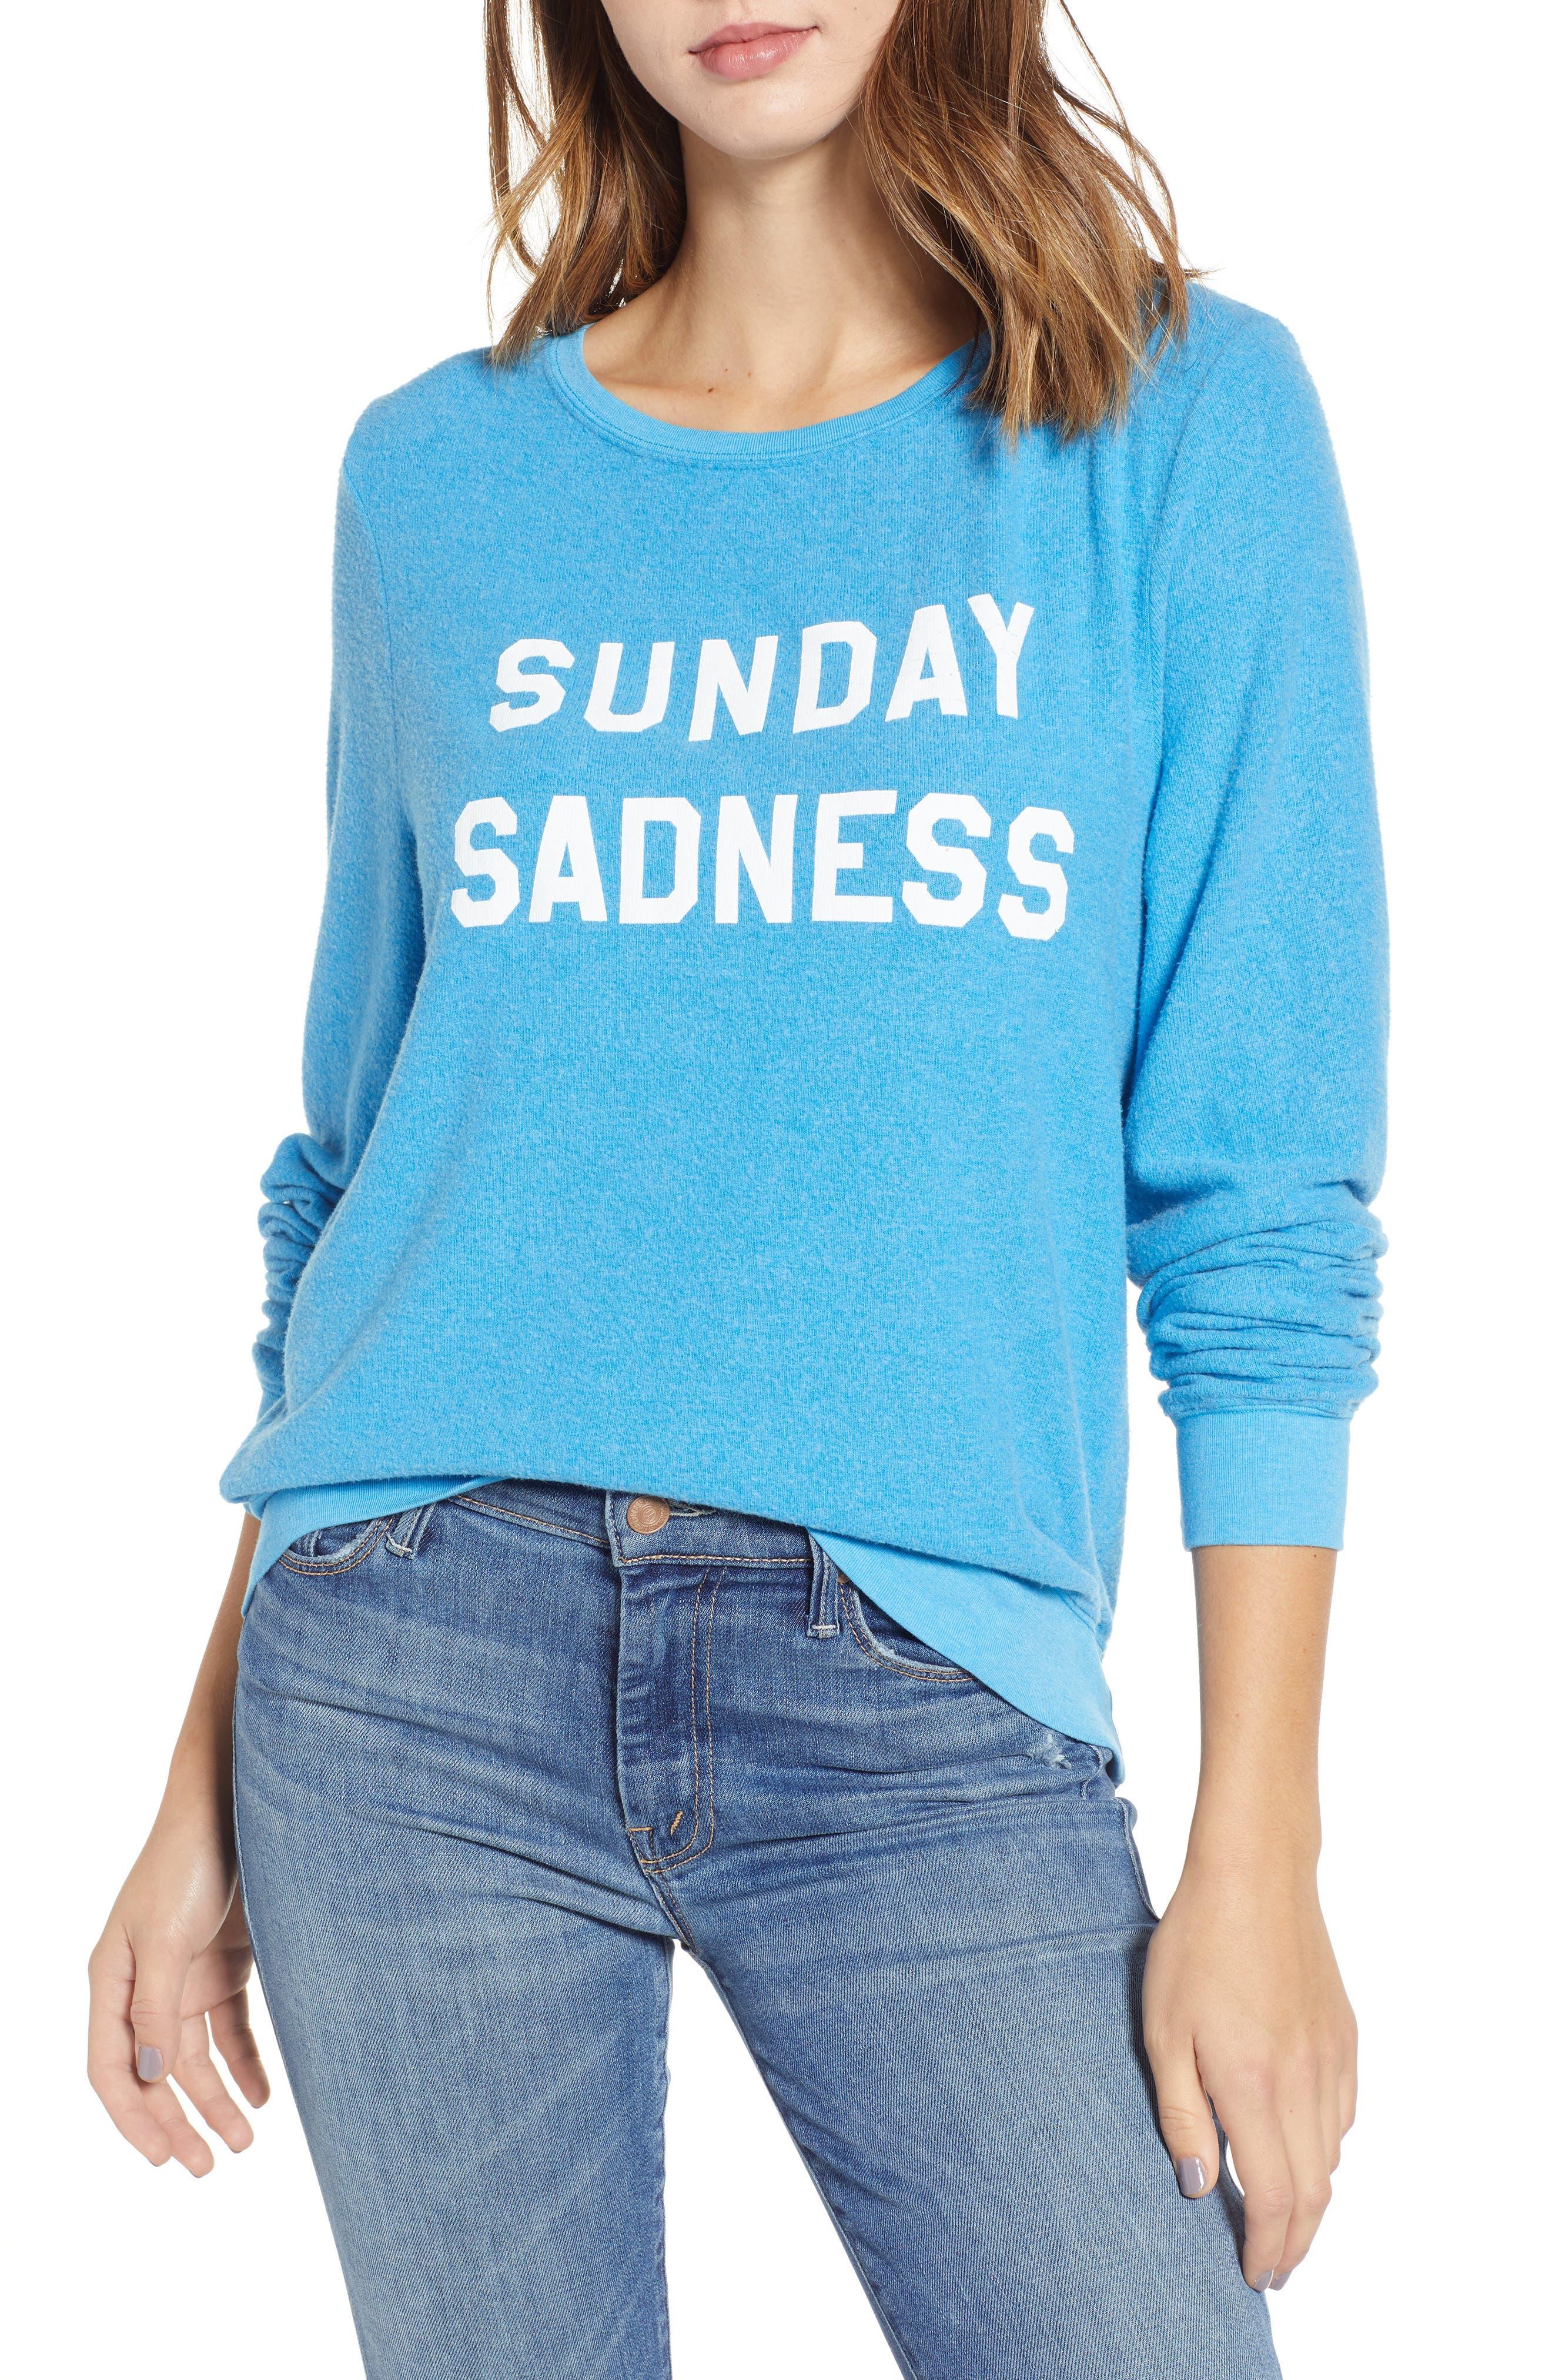 WILDFOX Baggy Beach Jumper - Sunday Sadness Pullover in Wonderland Blue